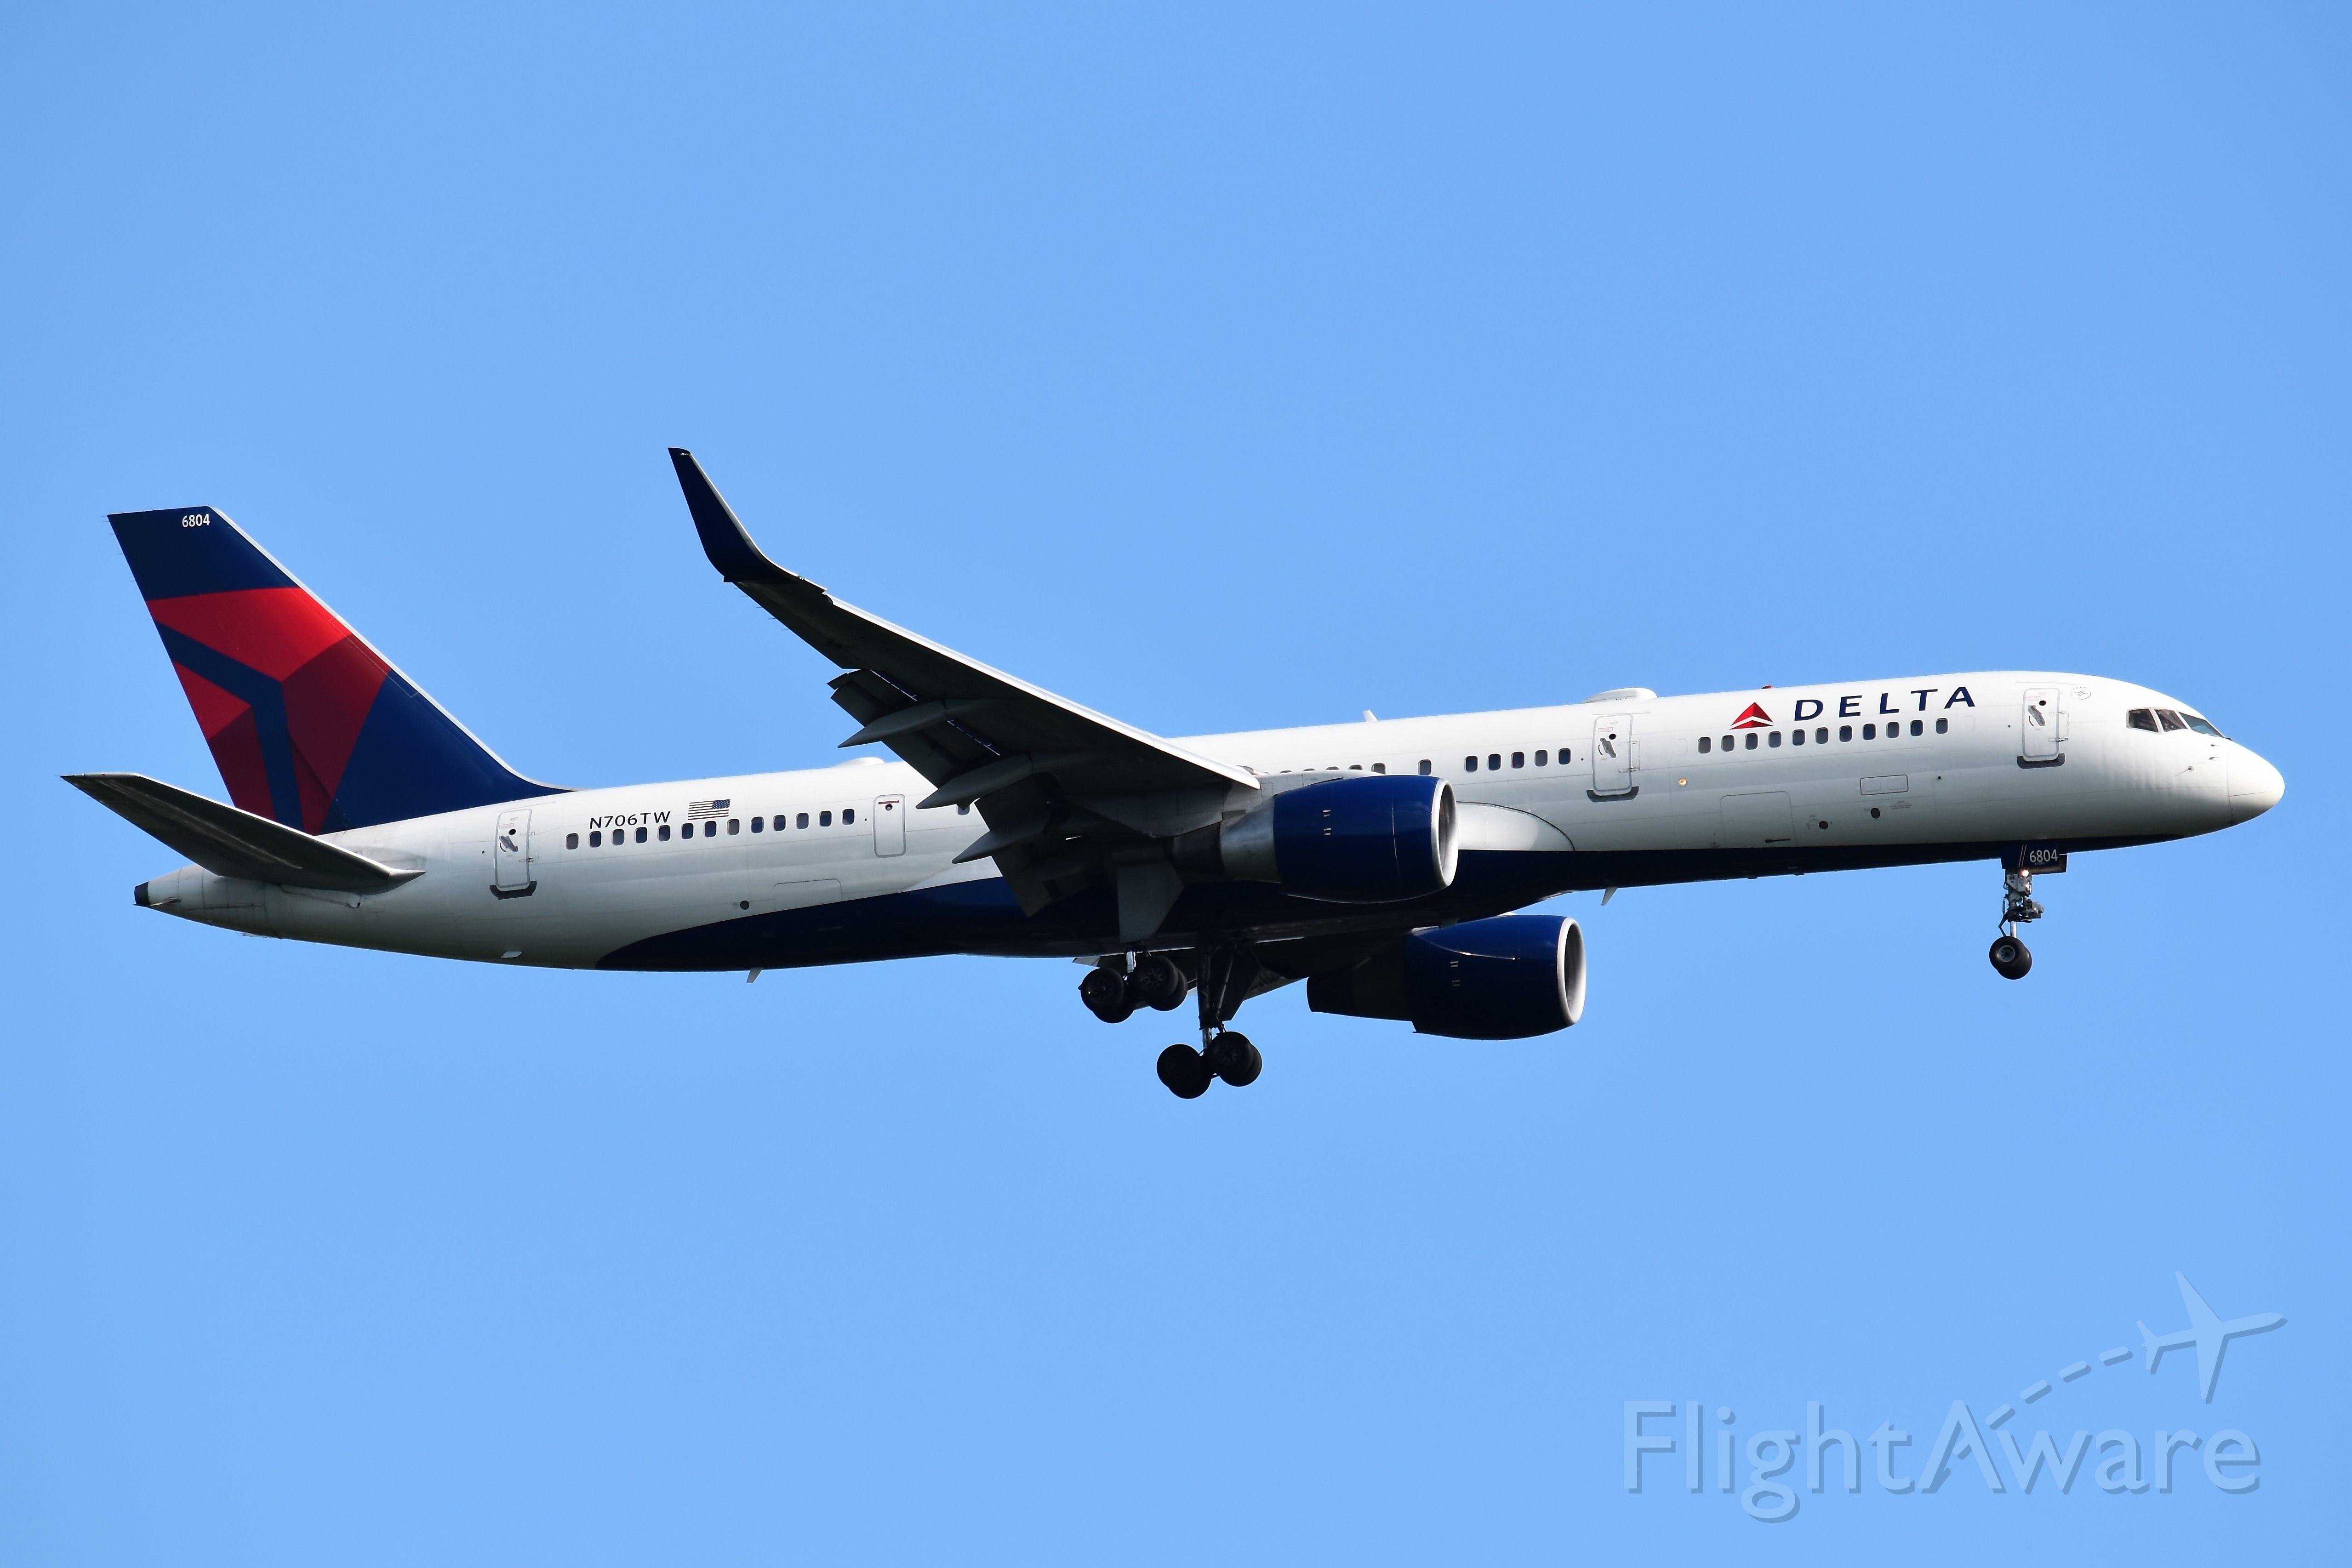 Boeing 757-200 (N706TW)